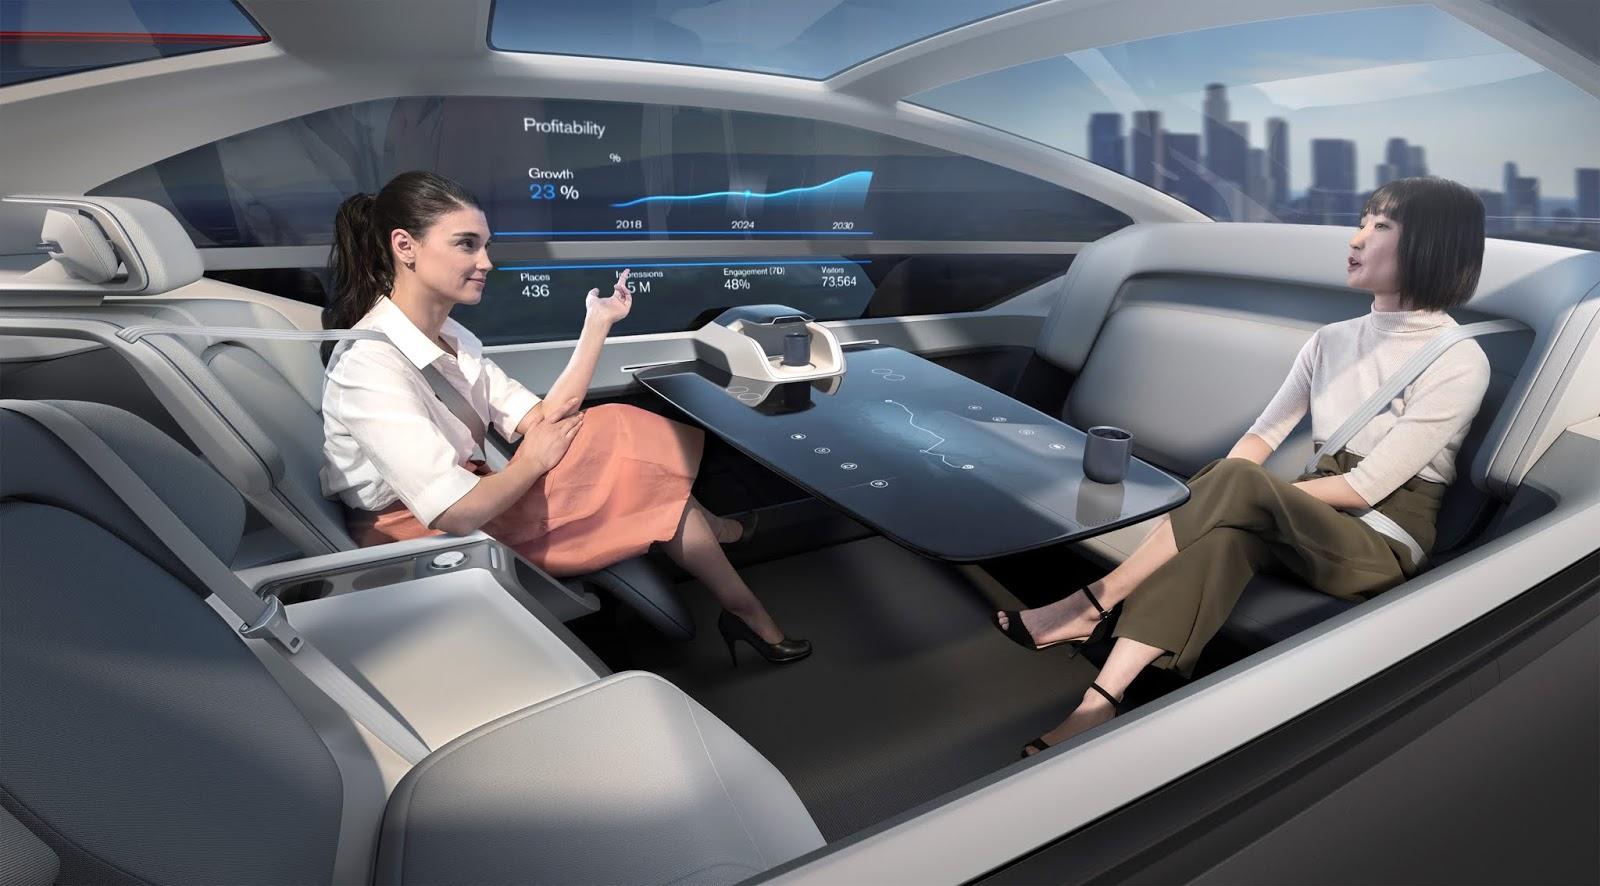 237052 Volvo 360c Interior Office 1 Το όραμα της Volvo χωρίς... τιμόνι Electric cars, Volvo, αυτόνομα, Αυτόνομη οδήγηση, Τεχνολογία